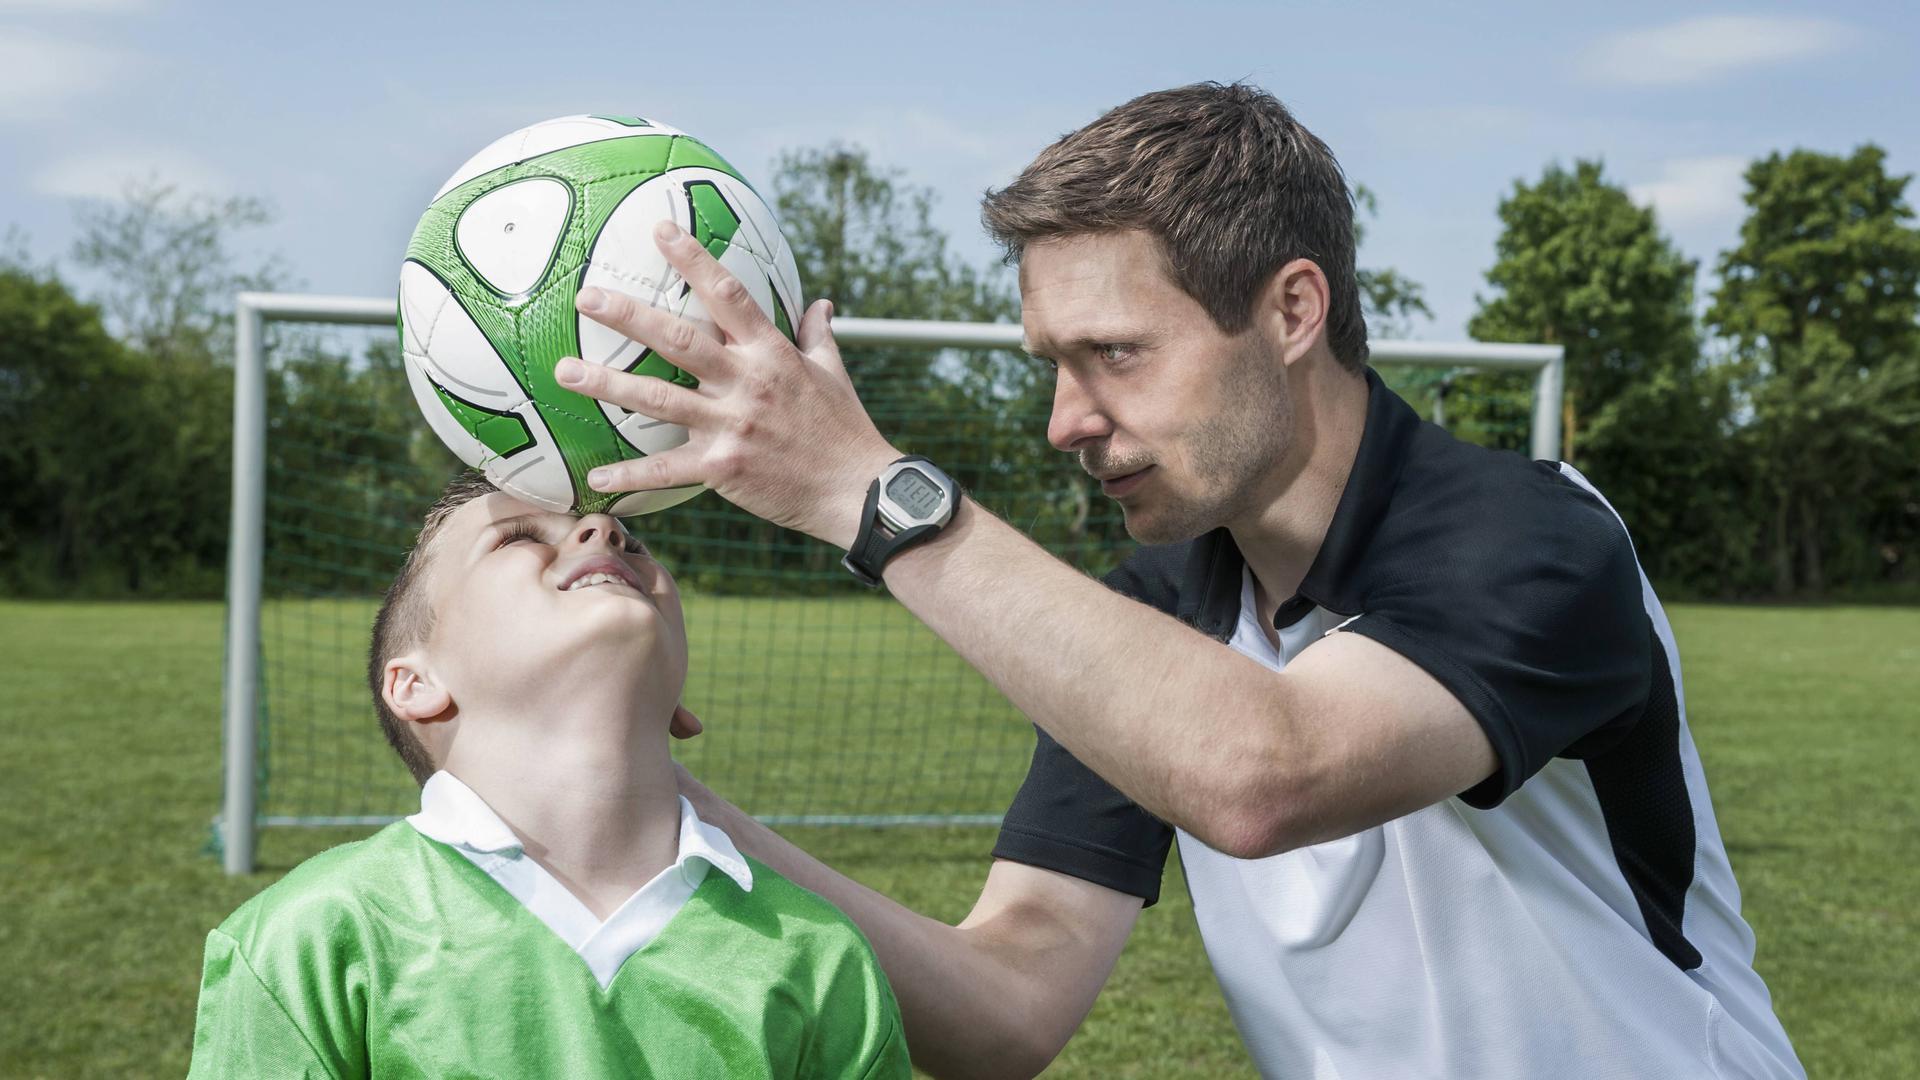 Kopfball, Training, Jugend, Fußball